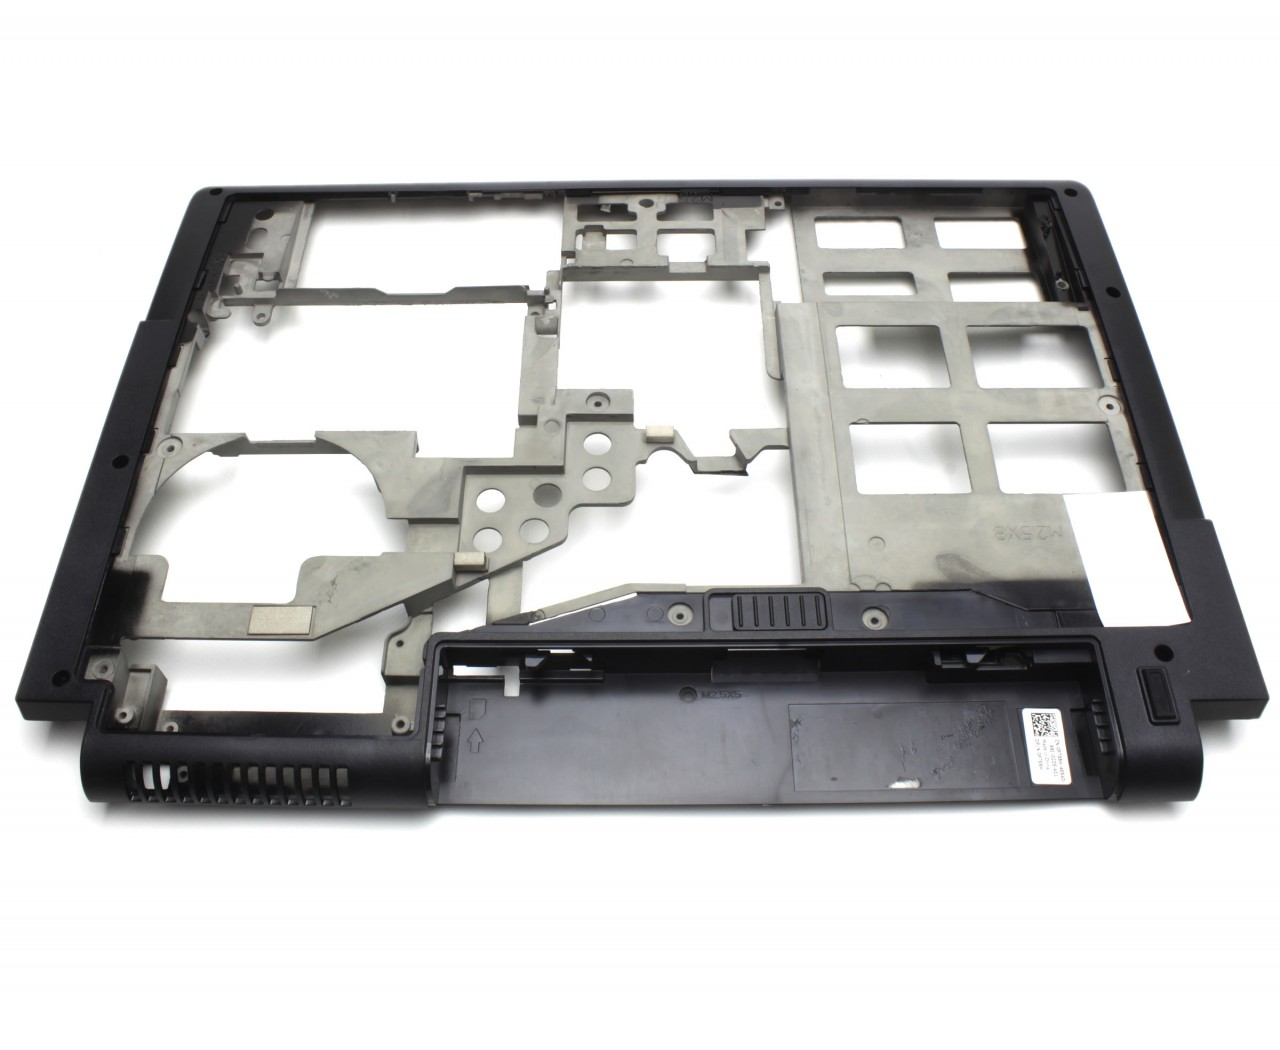 Bottom Case Dell CN 0T710G 38561 984 0087 A00 Carcasa Inferioara Neagra imagine powerlaptop.ro 2021